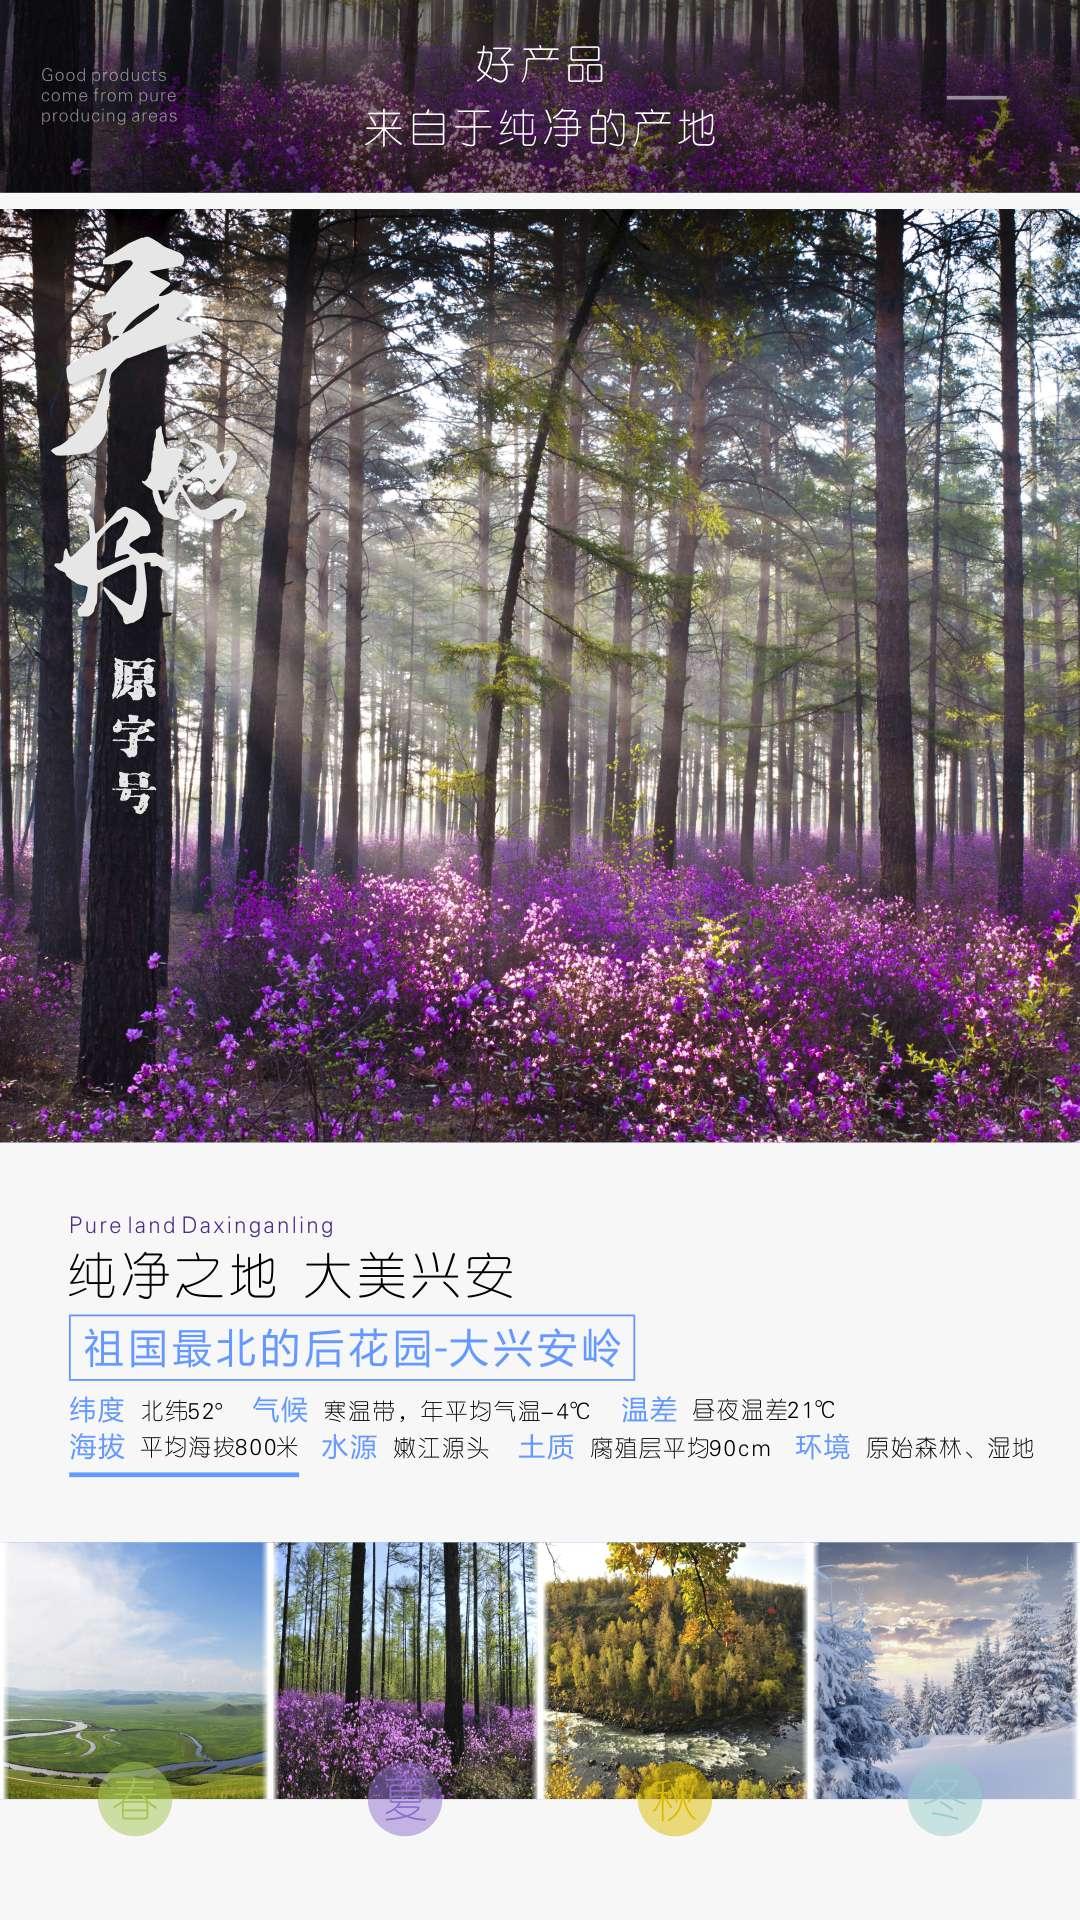 Z 至臻尚品-臻明眸藍莓花青素片-04.jpg